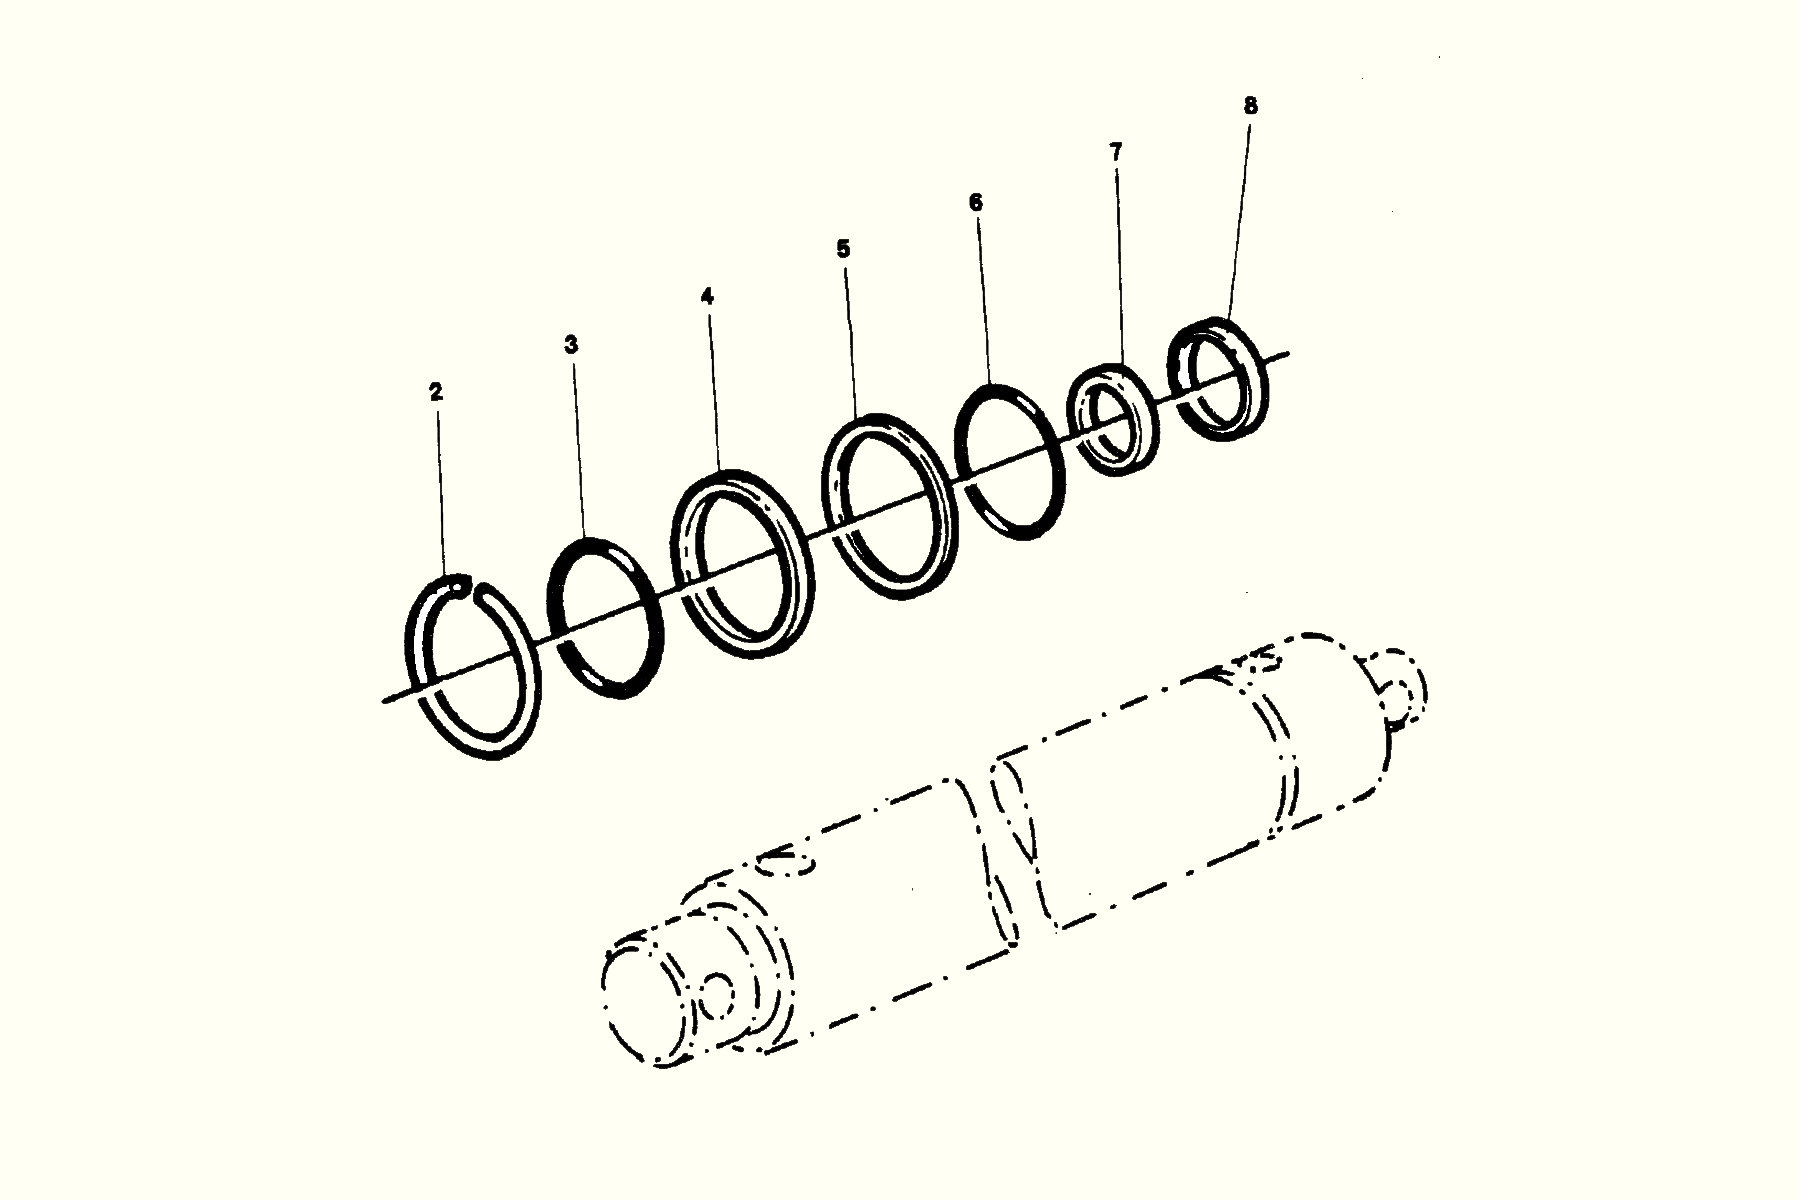 Softtop lift cylinder Repair kit Häggo Nr: 353 6431-601 Price: 100 SEK